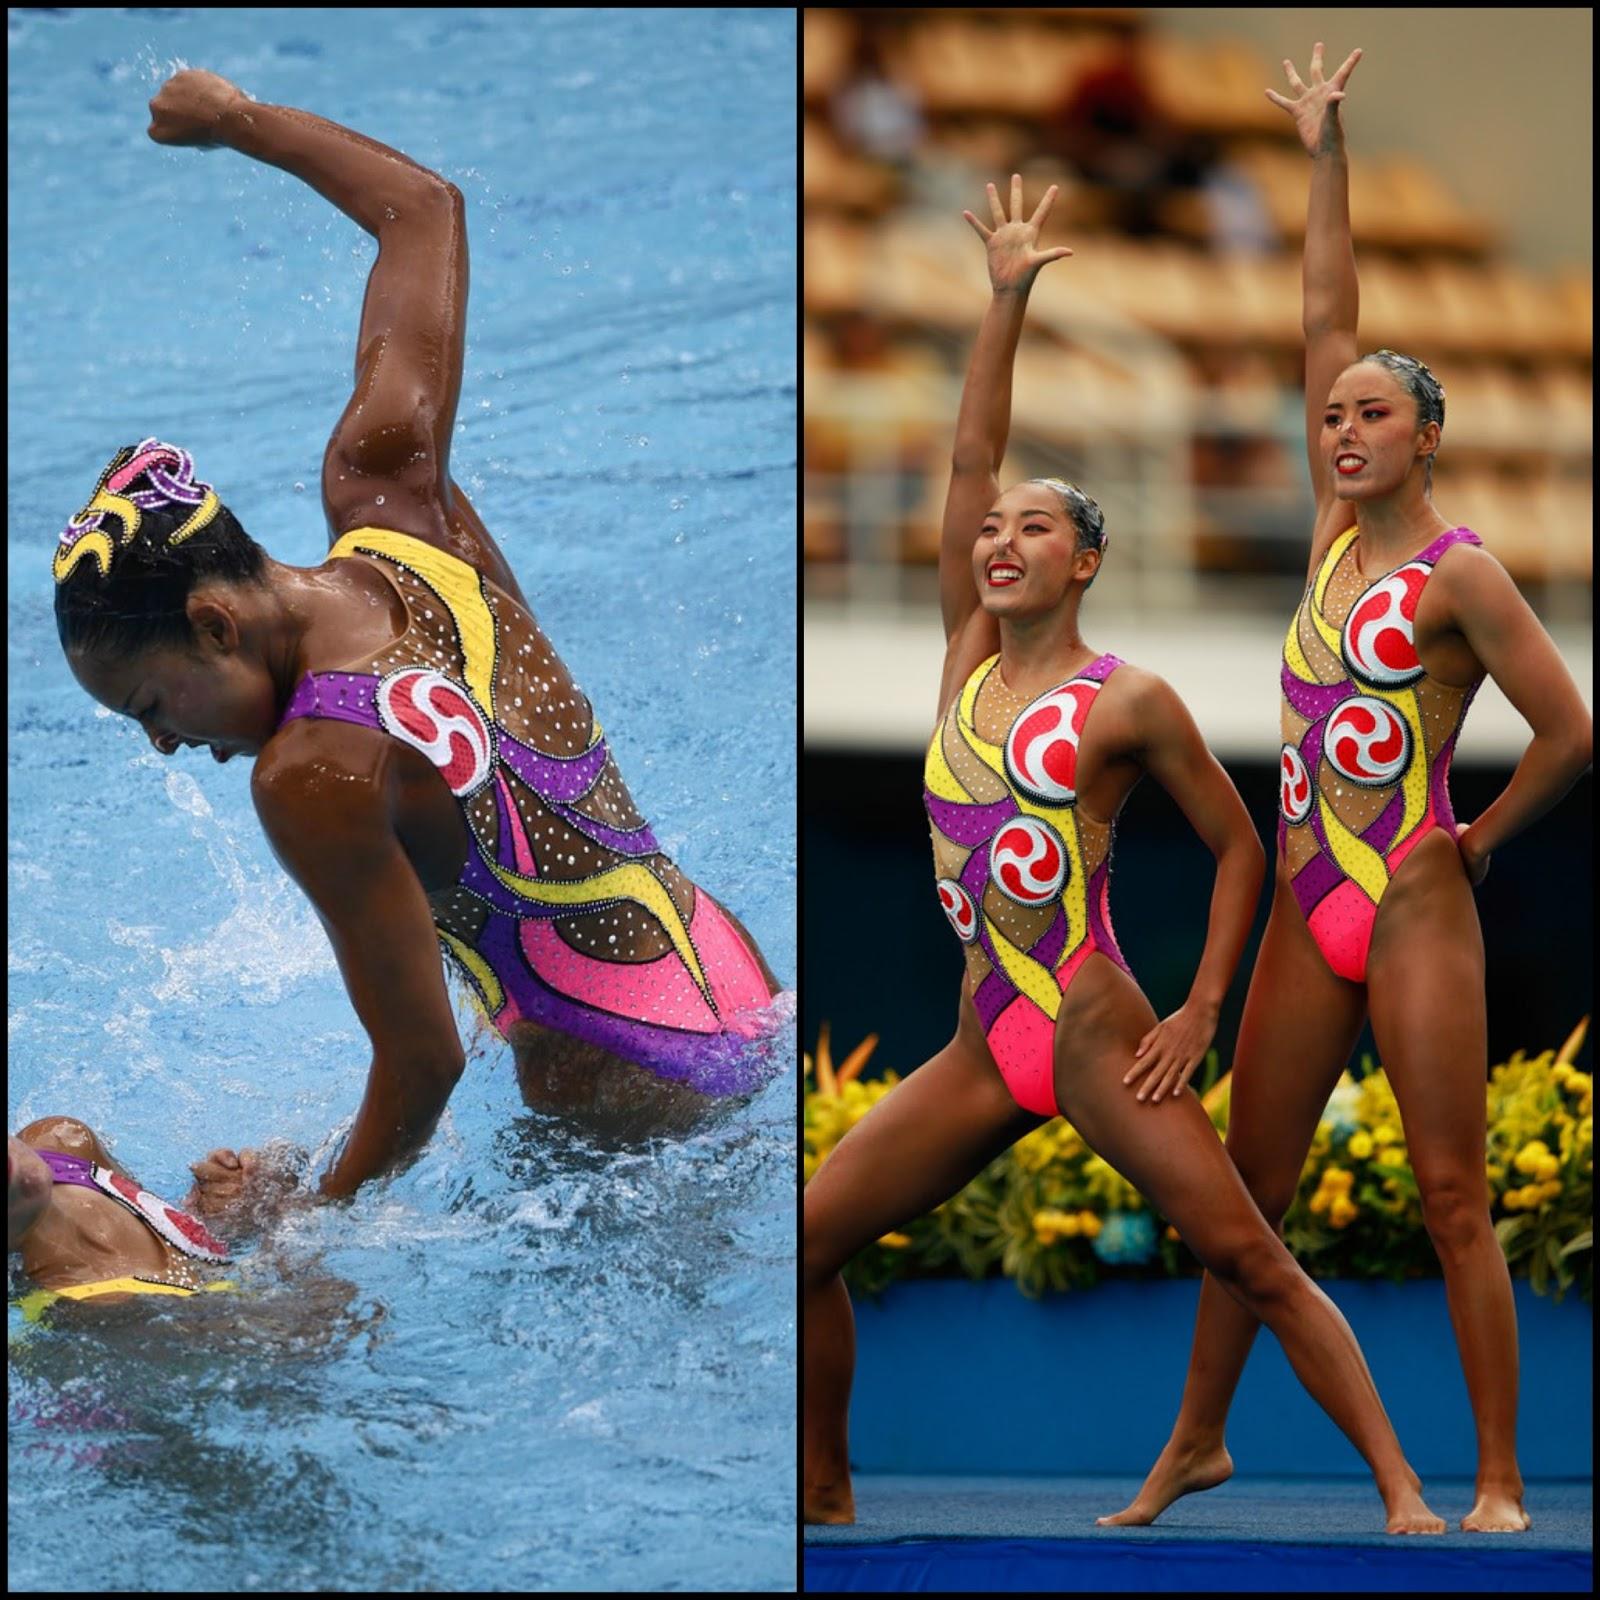 Olympic Stylerio 2016 Olympics Synchronized Swimming Duet